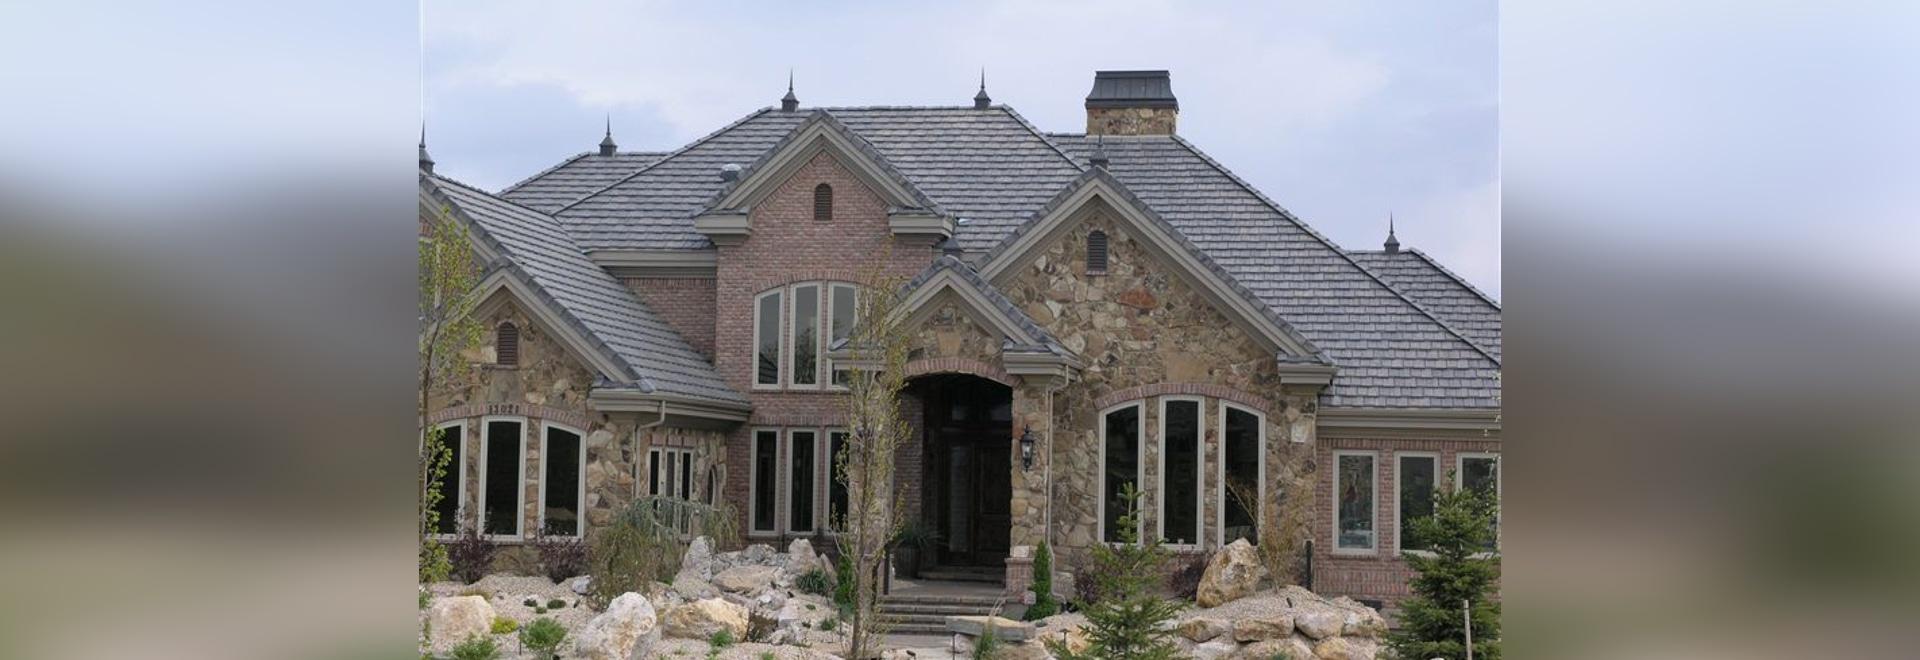 NEW: Flat Roof Tile By BARTILE Premuim Roofing Tiles